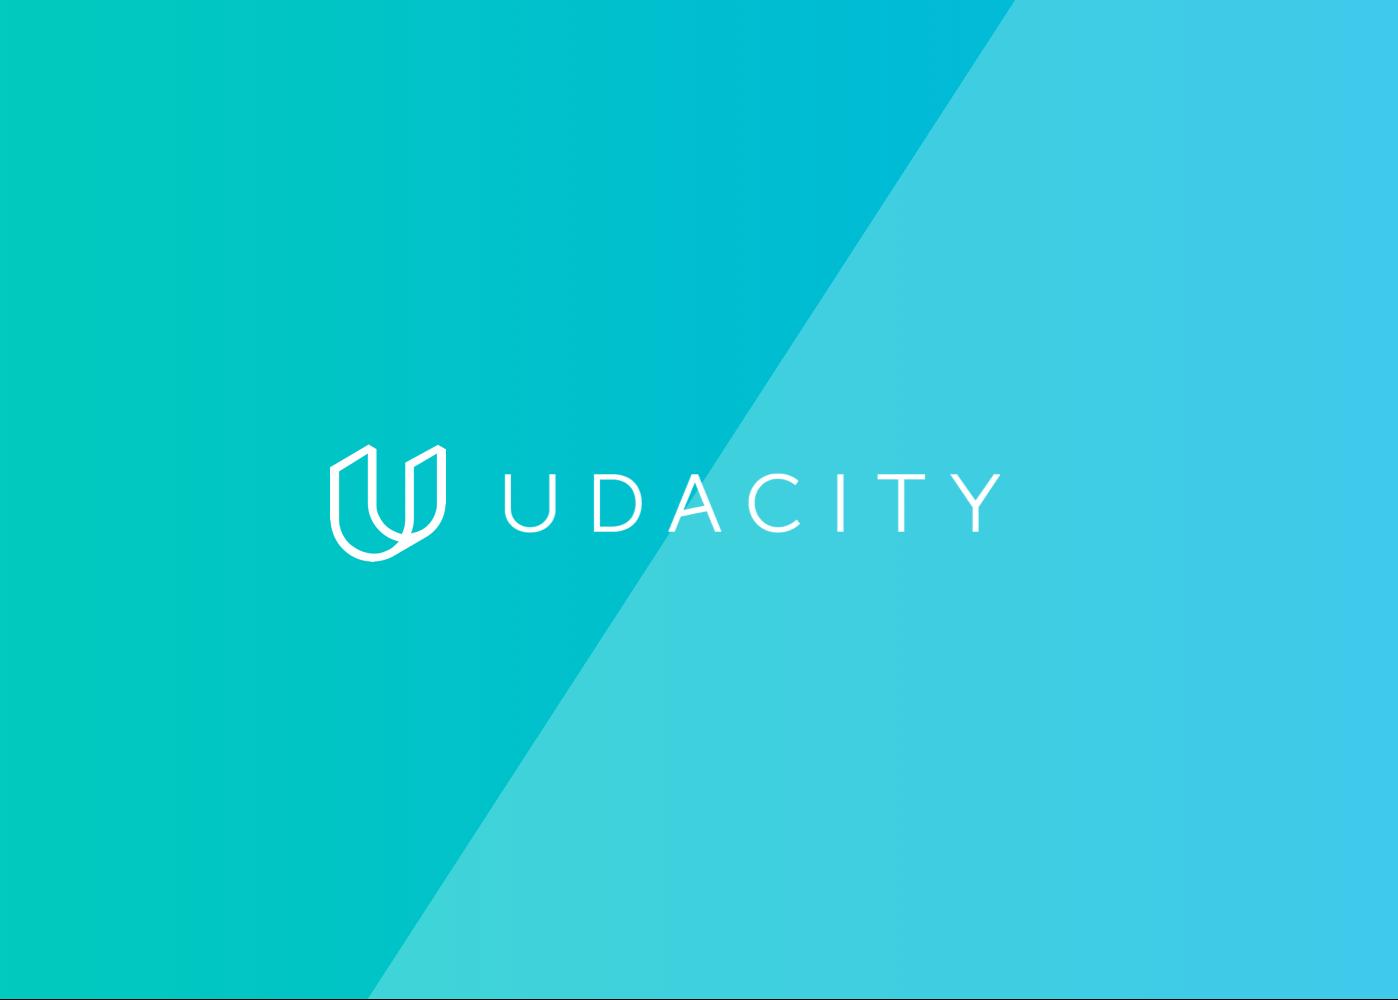 udacity_thumbnail_2x